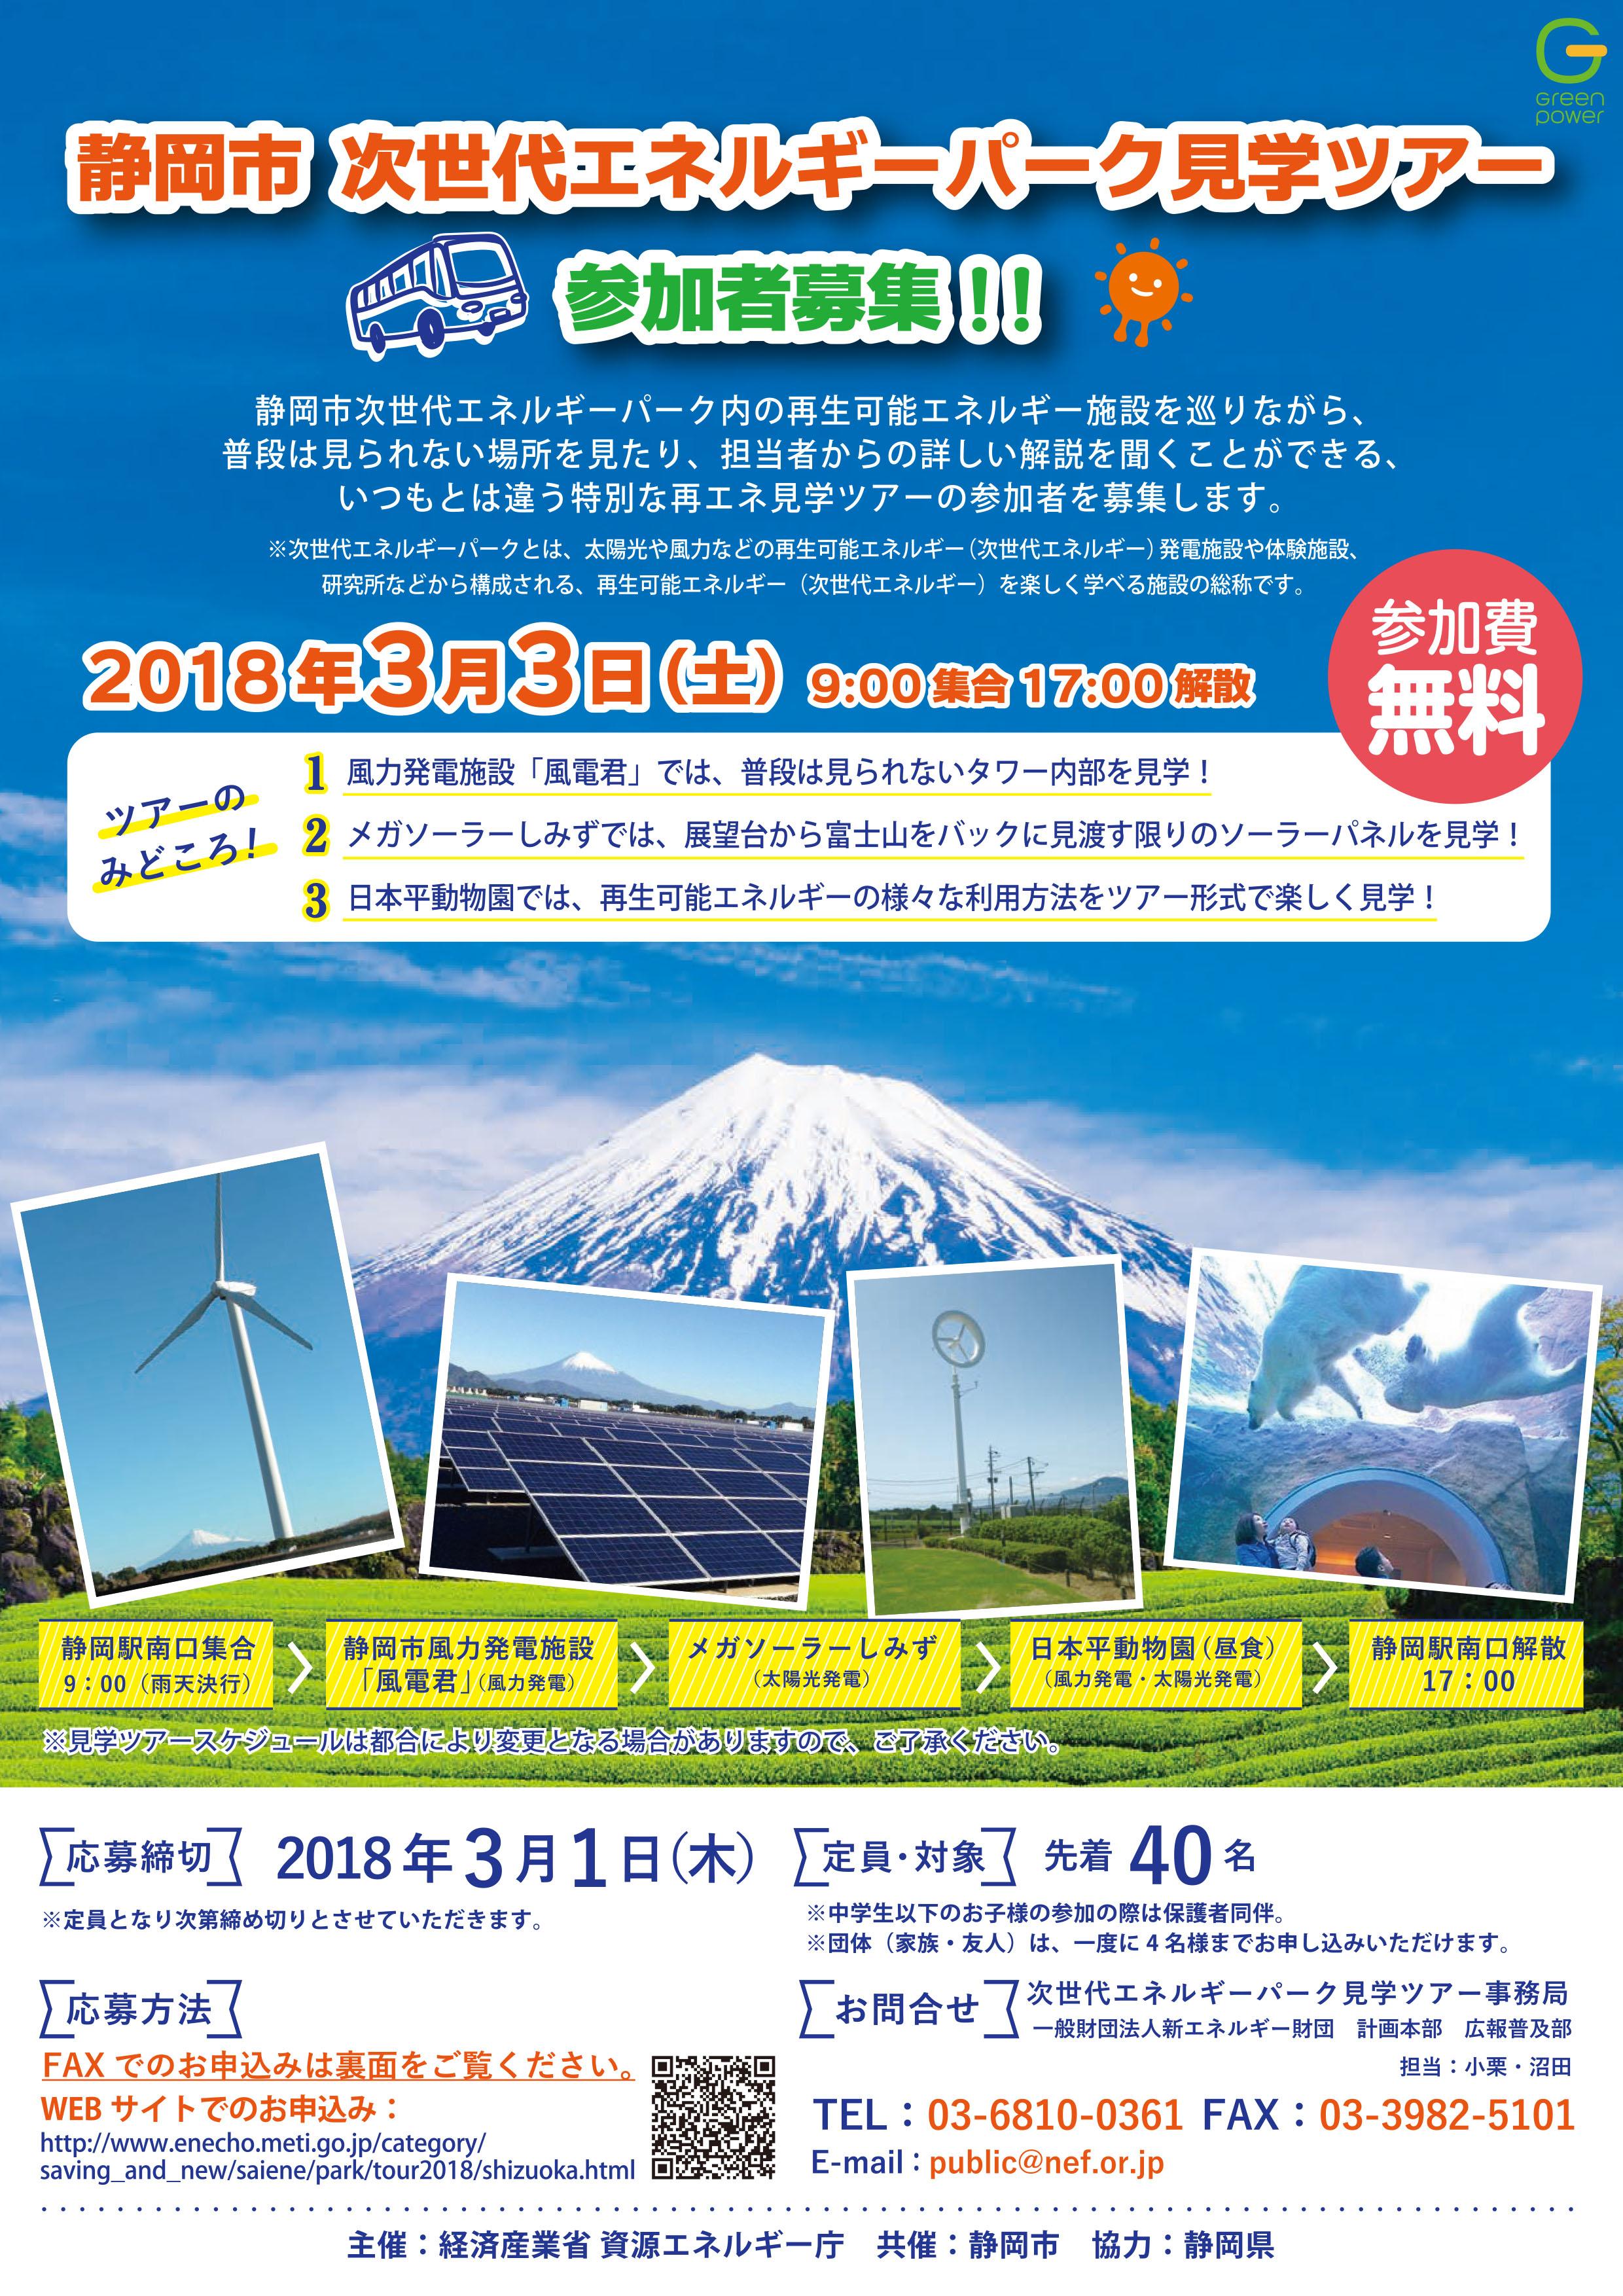 http://www.shizutan.jp/ondanka/event/images/shizu_omo.jpg